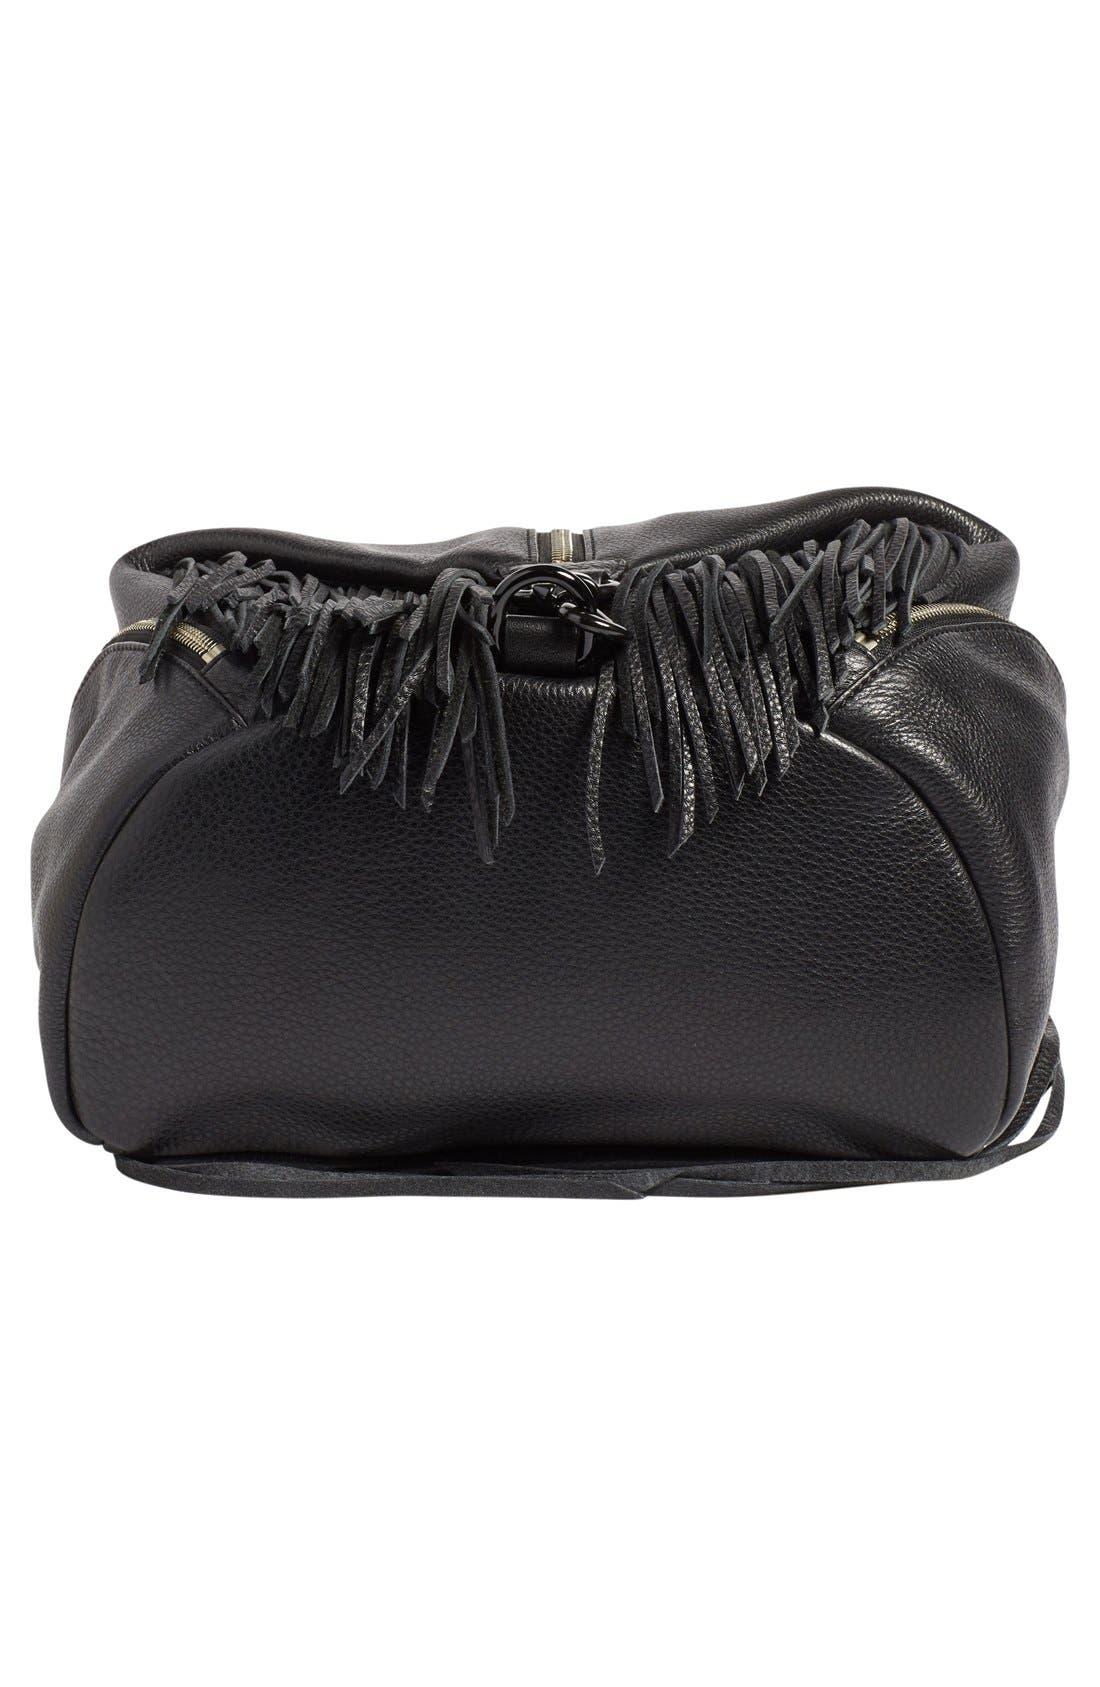 'Fringe Julian' Backpack,                             Alternate thumbnail 6, color,                             Black